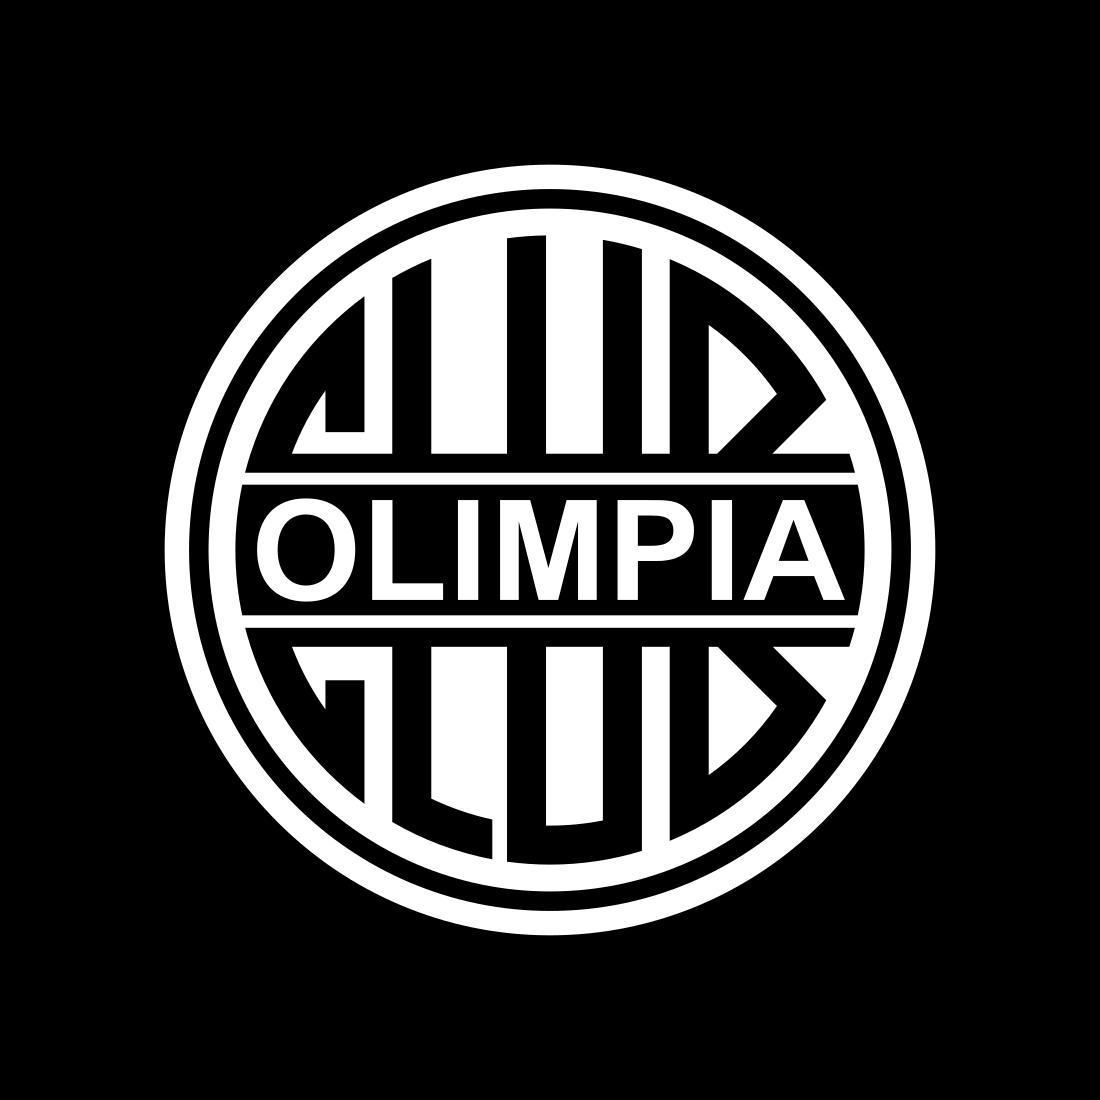 olimpia-logo-escudo-3